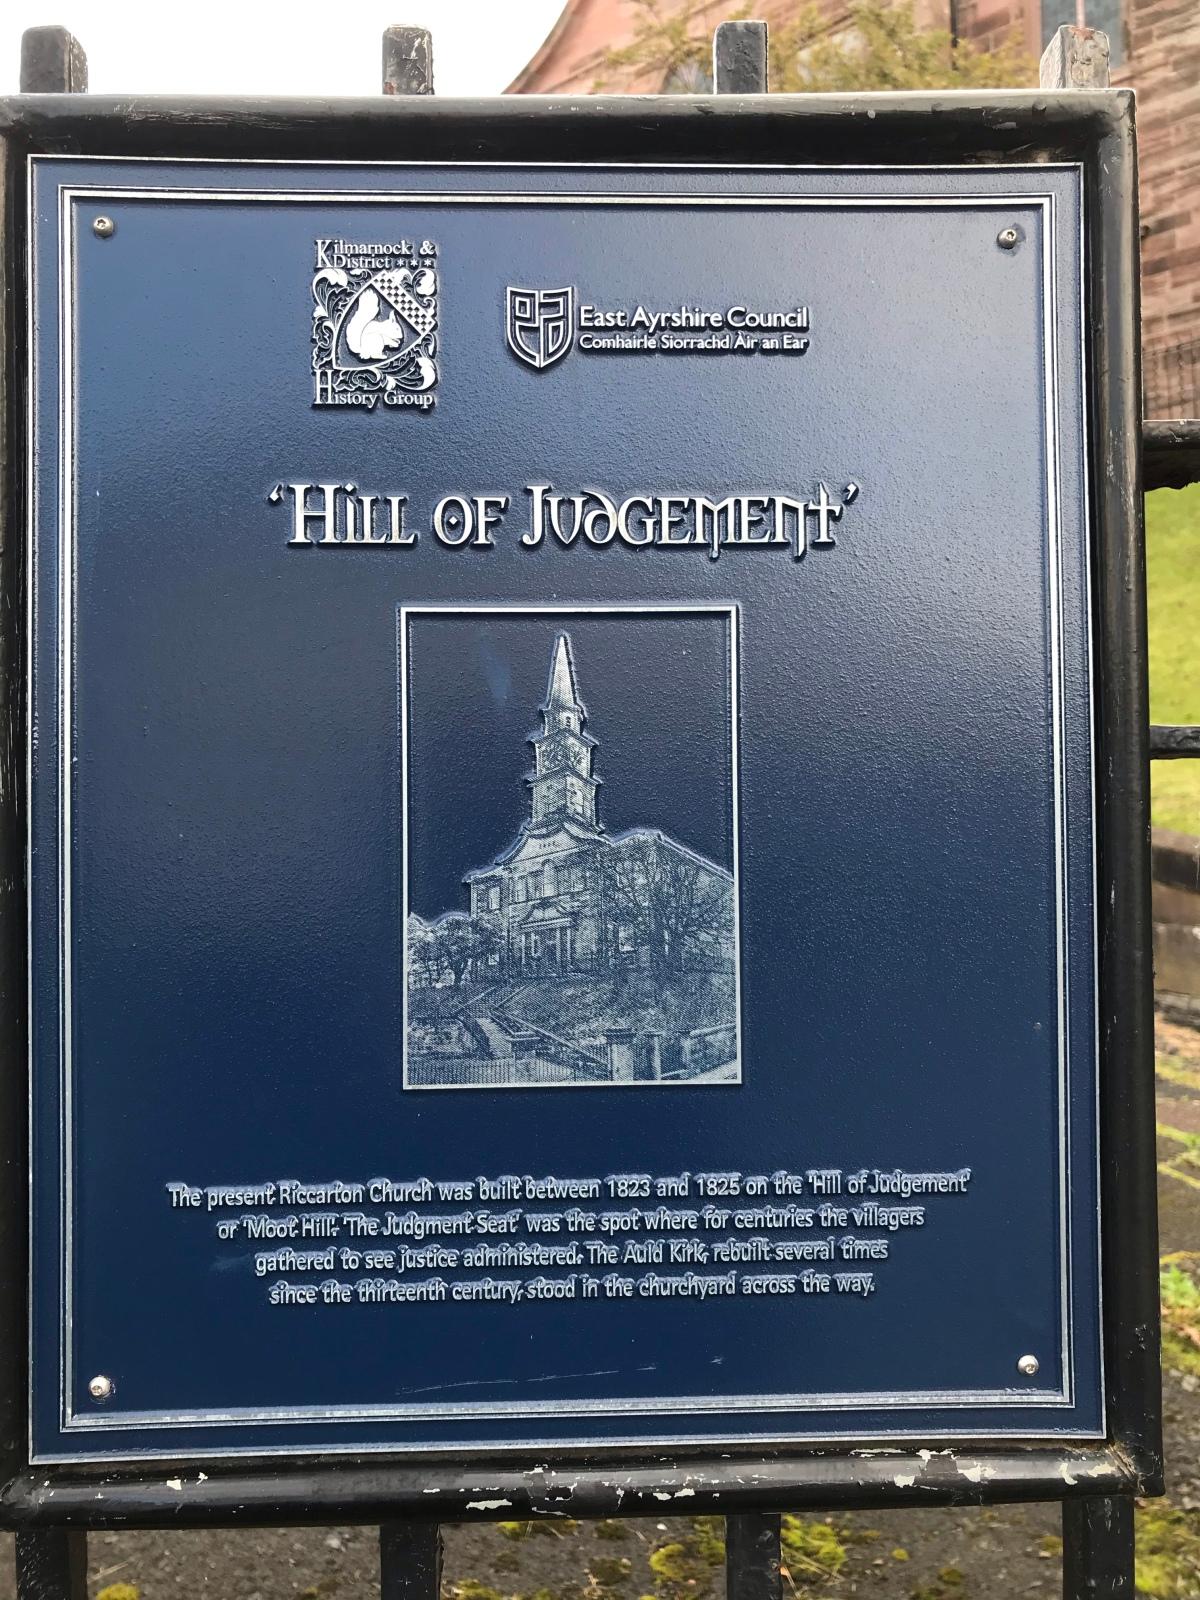 The Hill ofJudgement